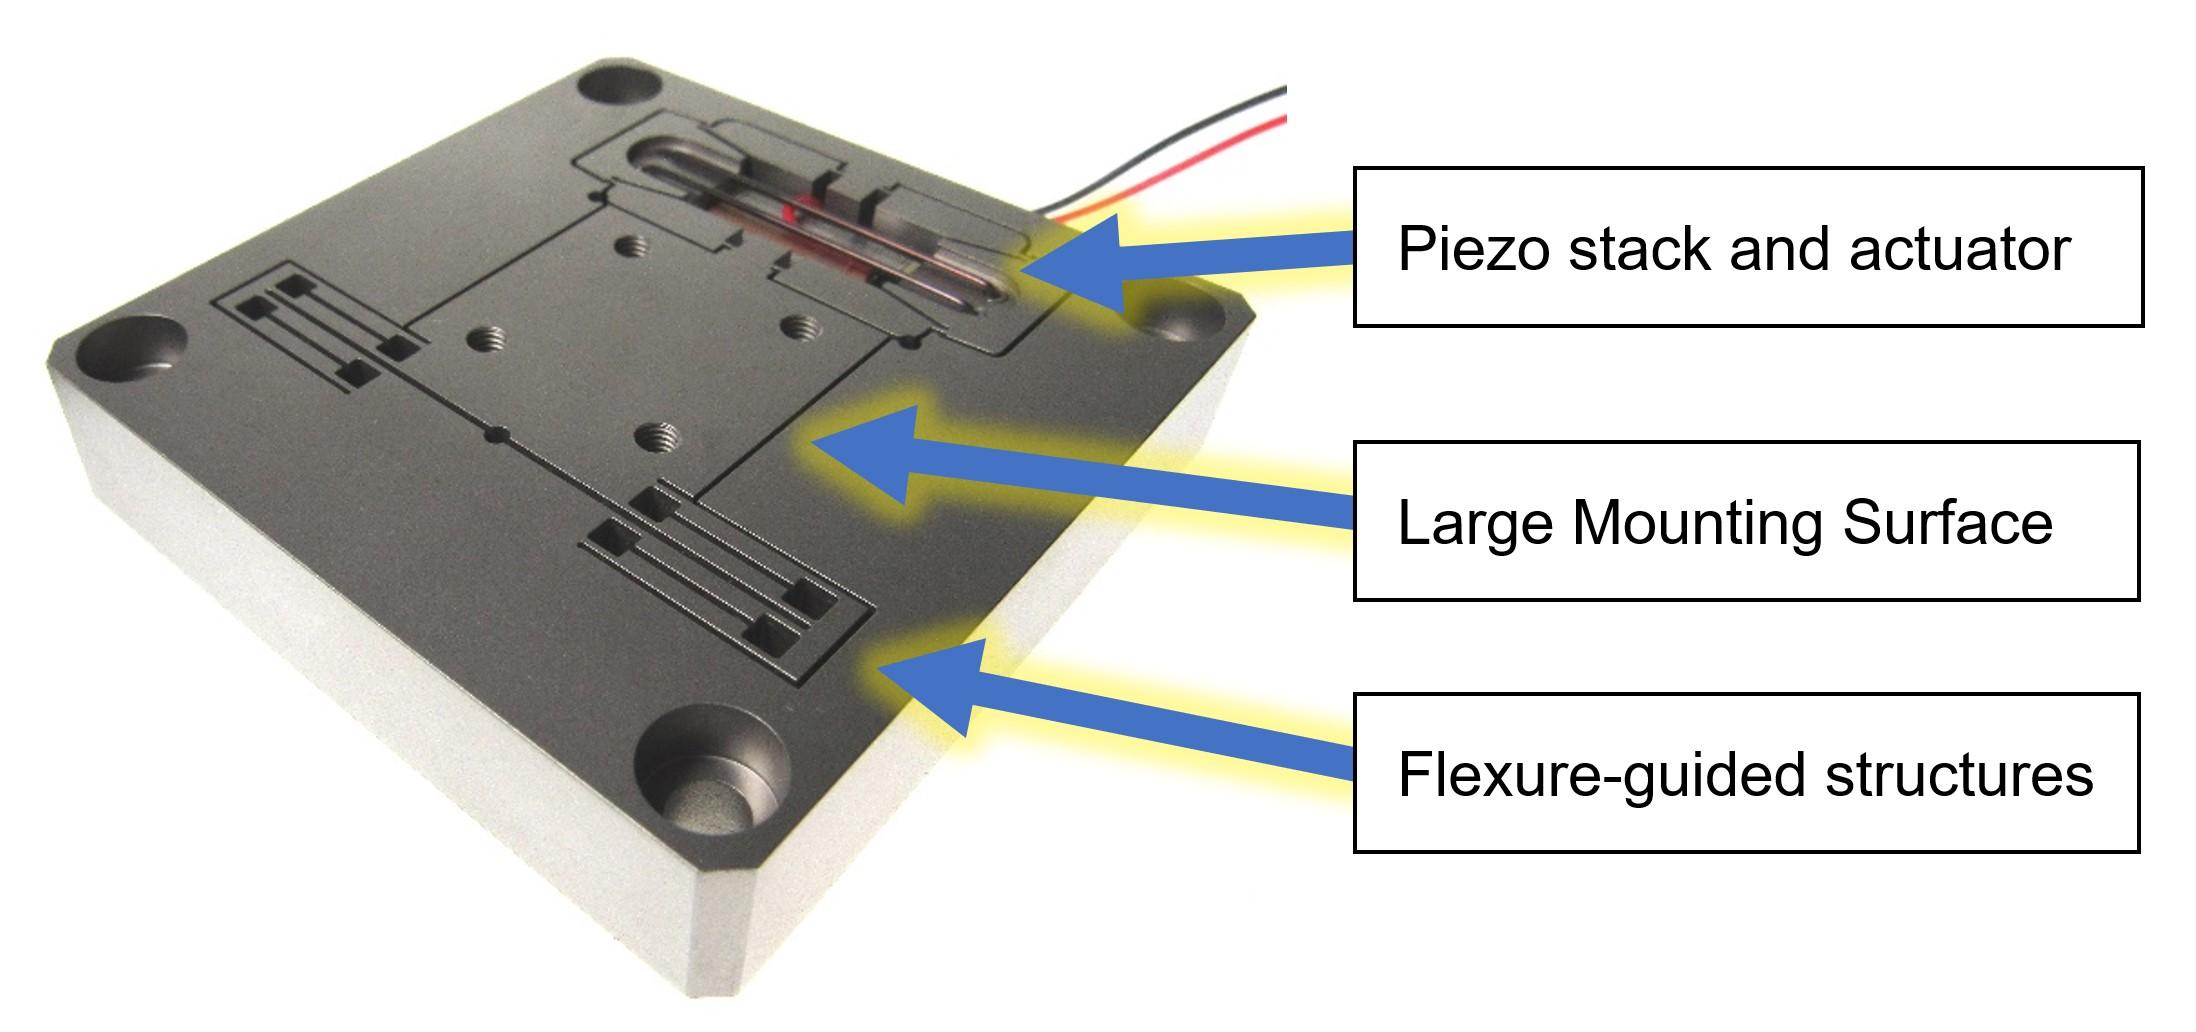 Piezo Stage Architecture Description